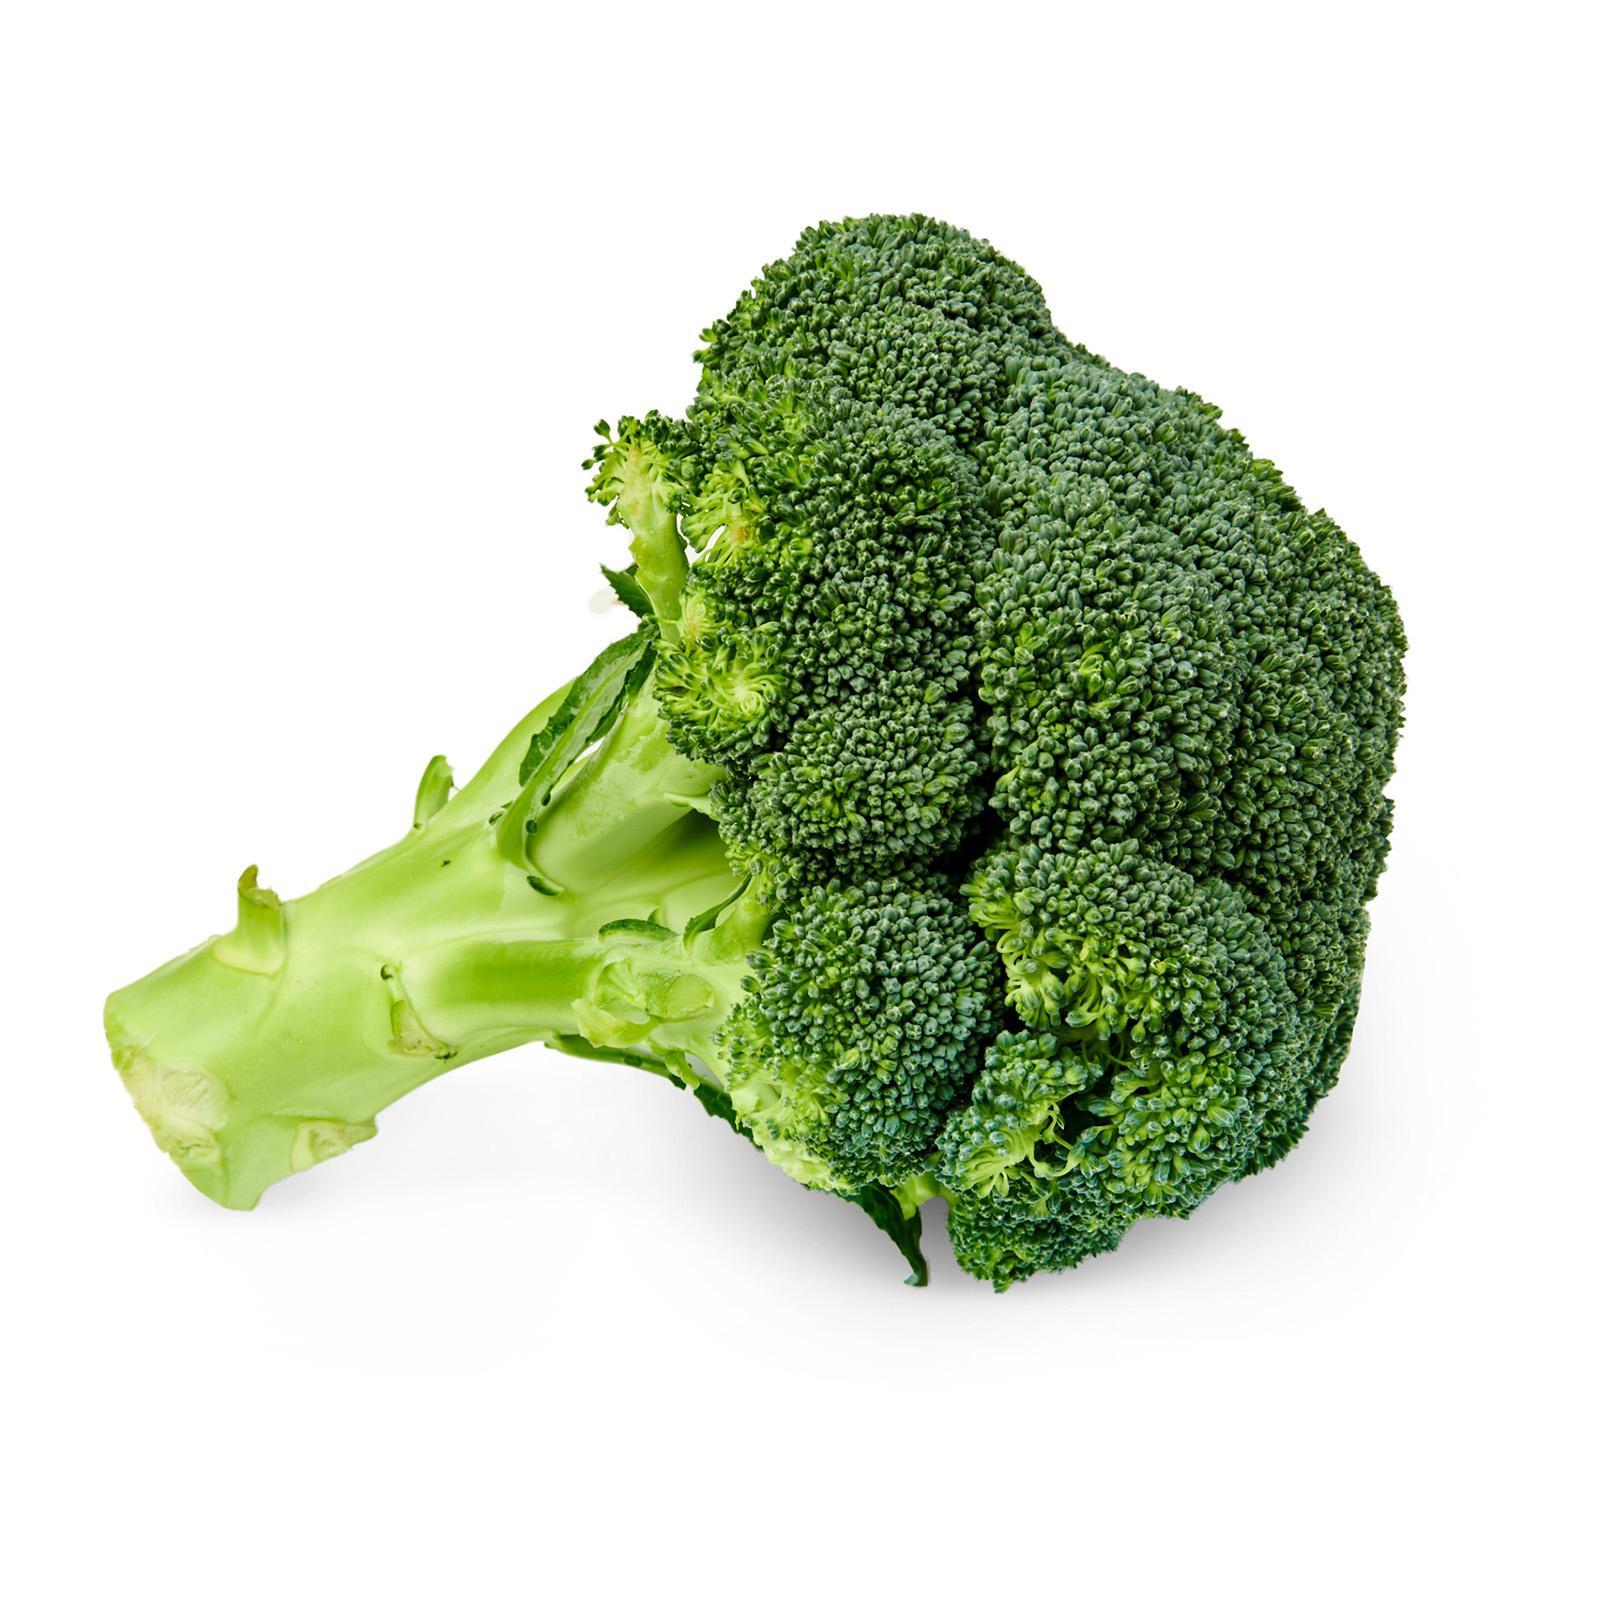 Yuvvo Broccoli By Redmart.